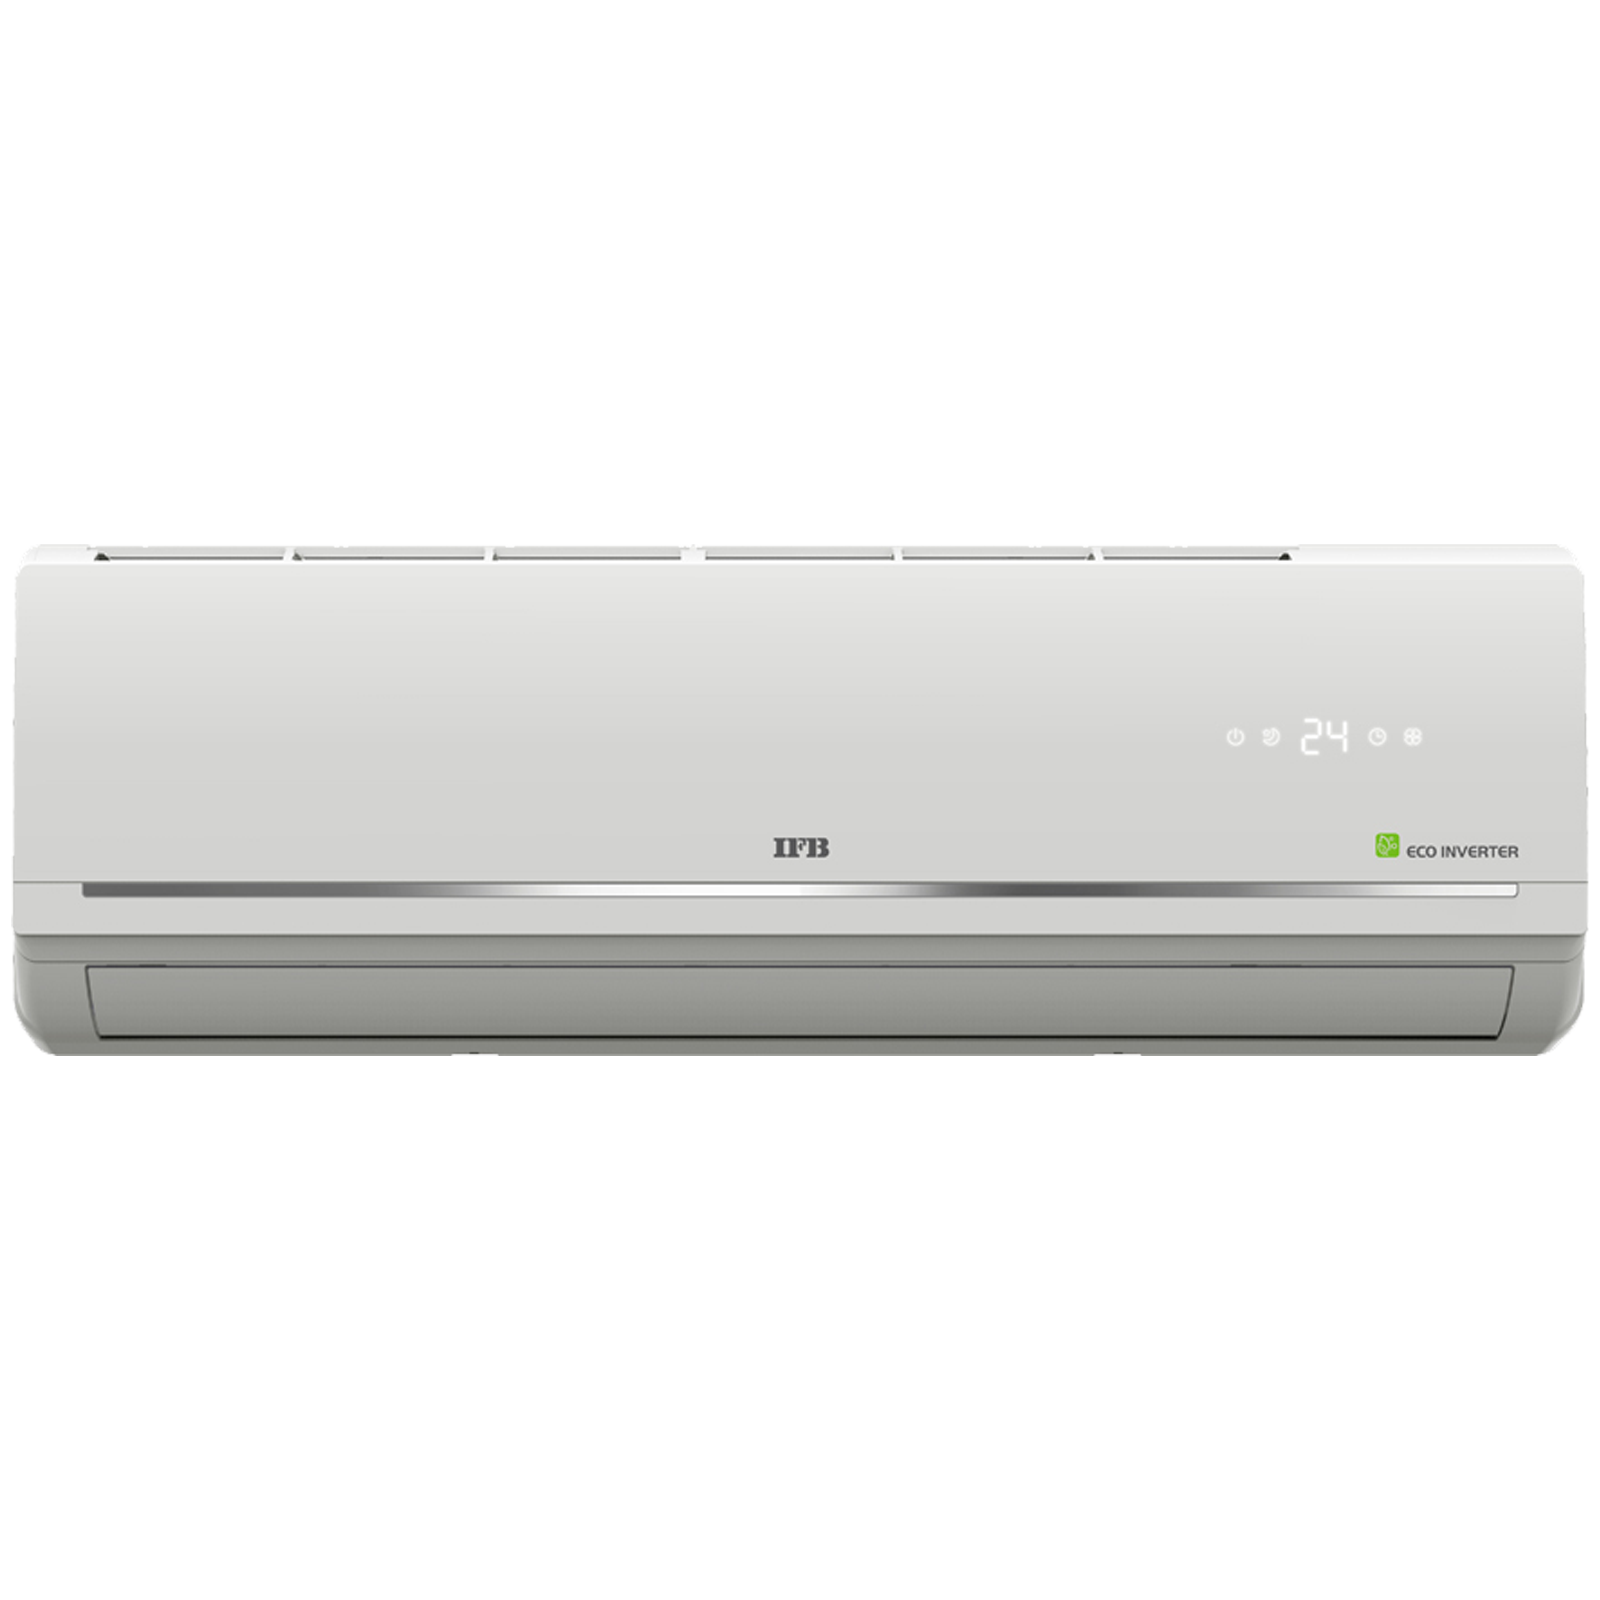 IFB Key Accounts 1 Ton 3 Star Inverter Split AC (Copper Condenser, IACI12BD3G3C, White)_1